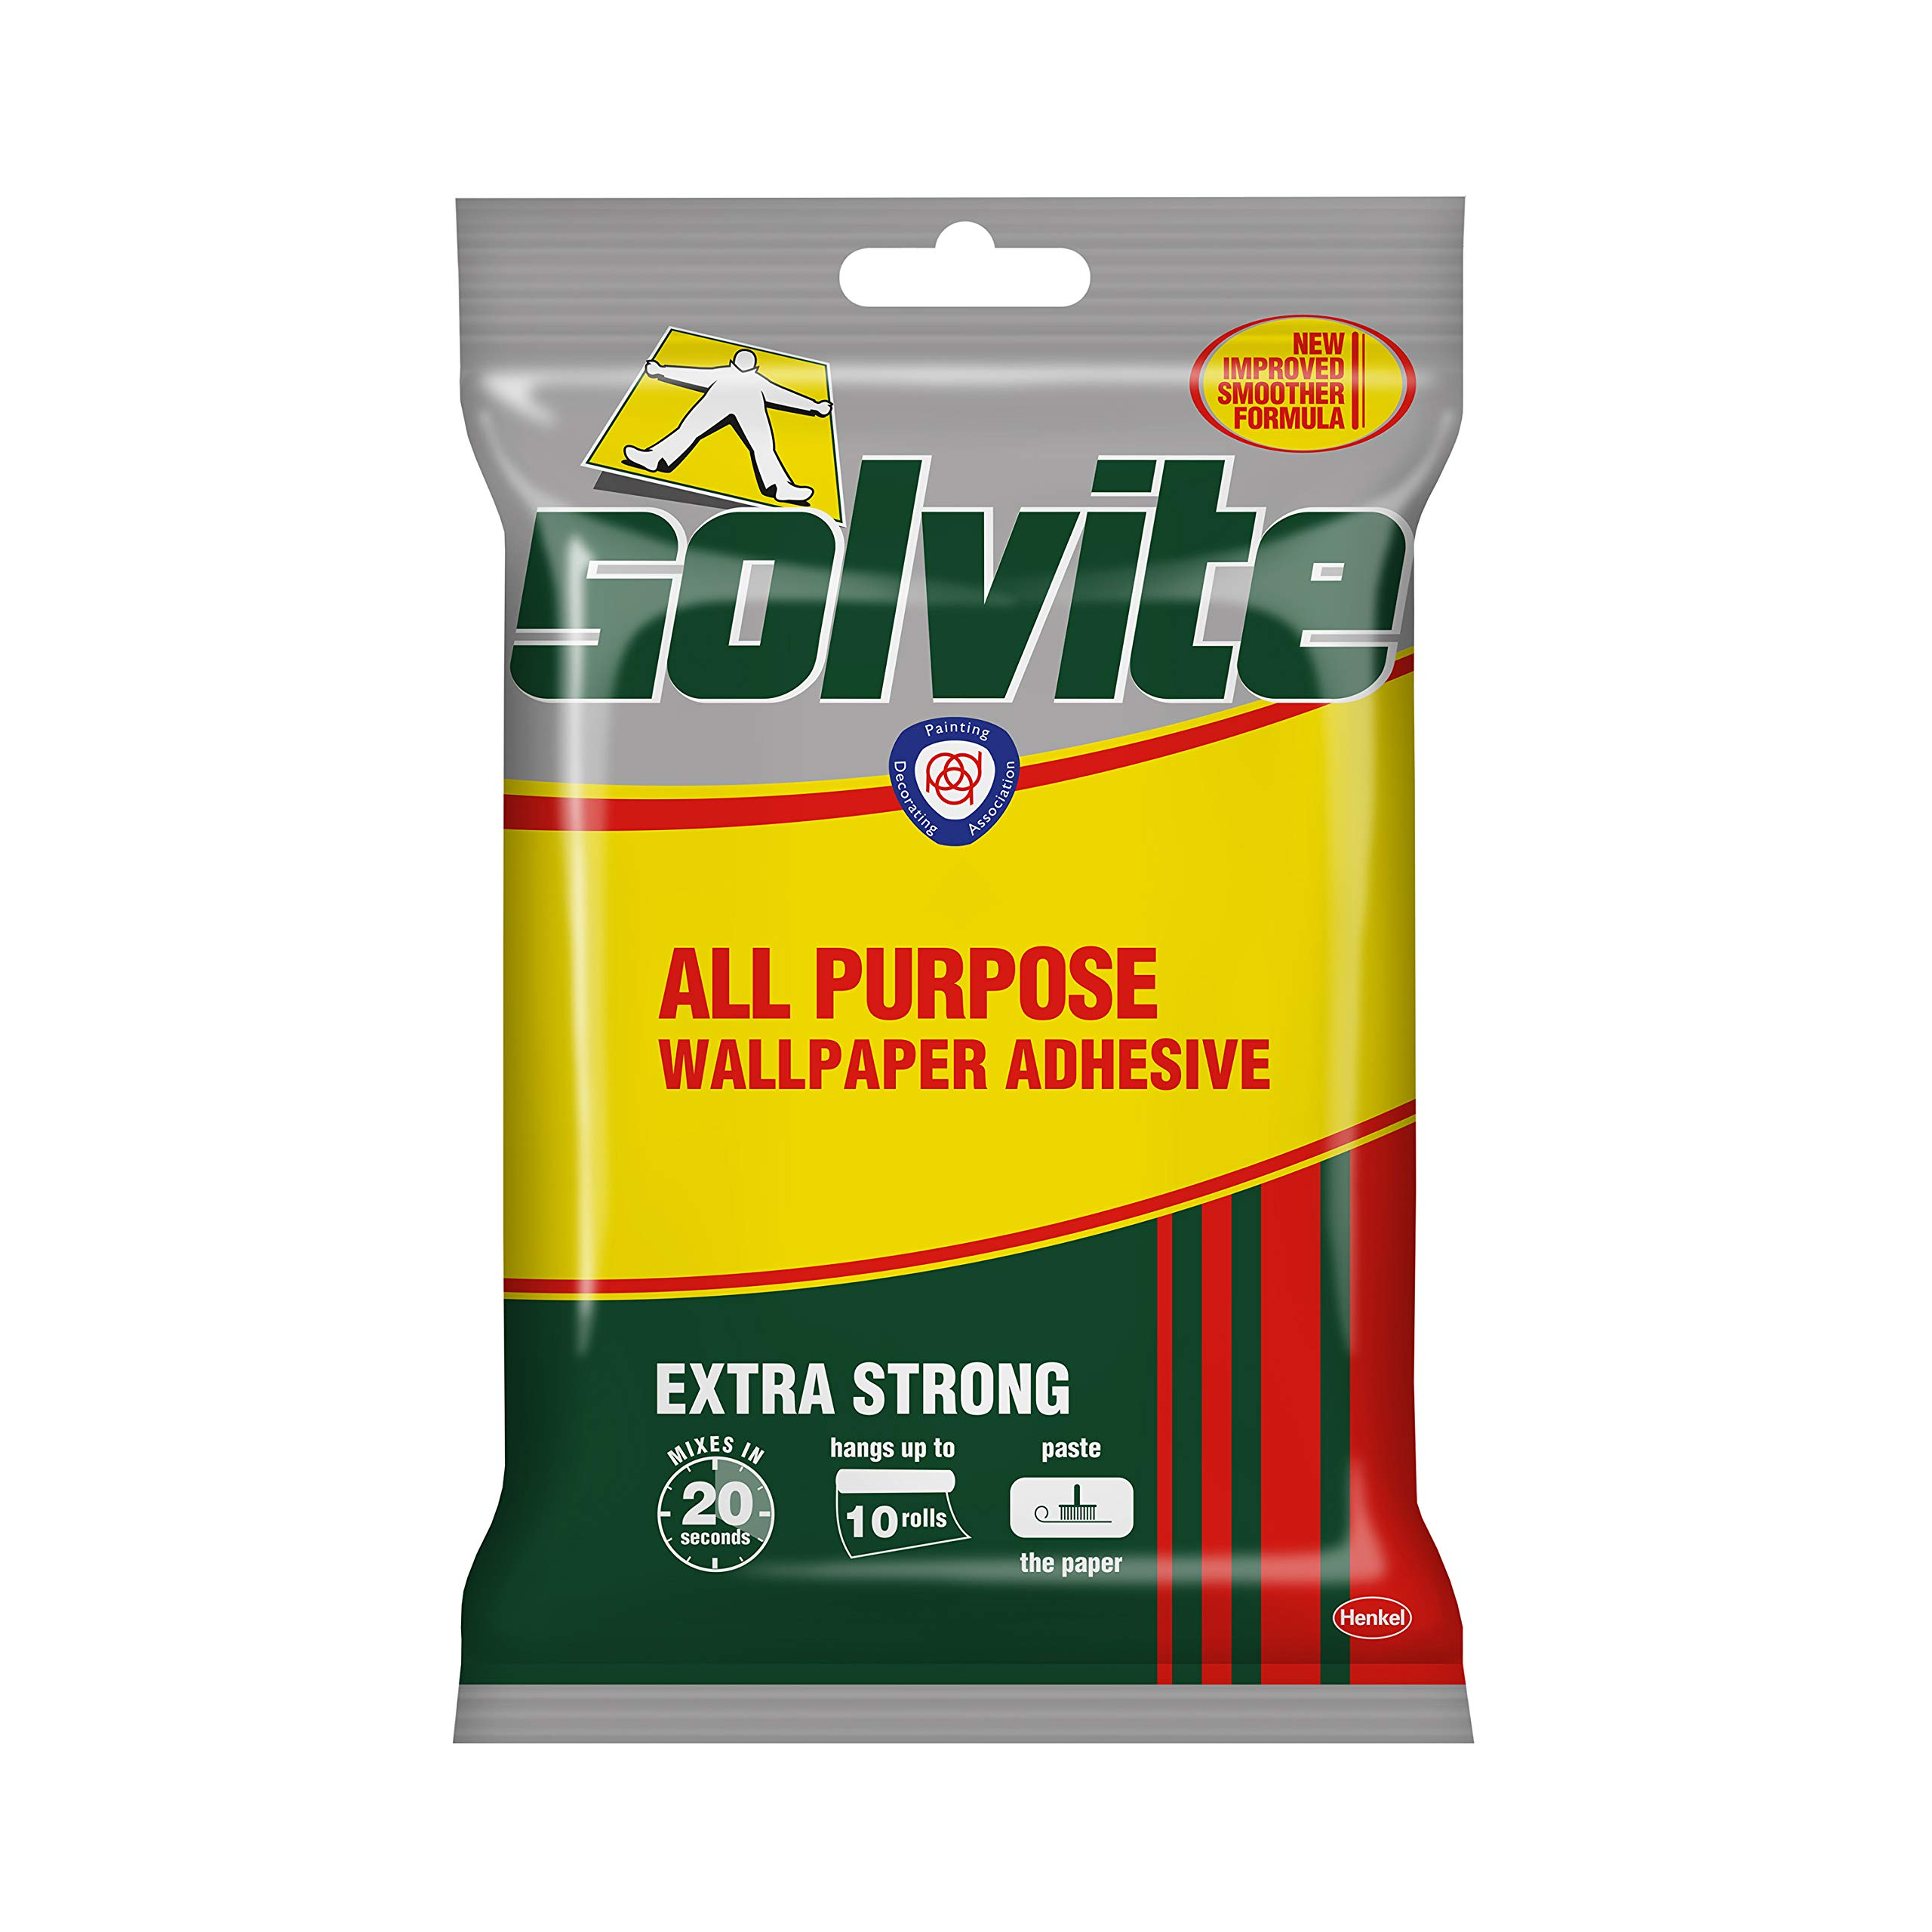 Solvite All-Purpose Wallpaper Adhesive, Reliable Adhesive for Wallpaper, All-Purpose Adhesive with Long-Lasting Results, Wallpaper Paste Hangs Upto 10 Rolls (1 x 185 g Sachet)